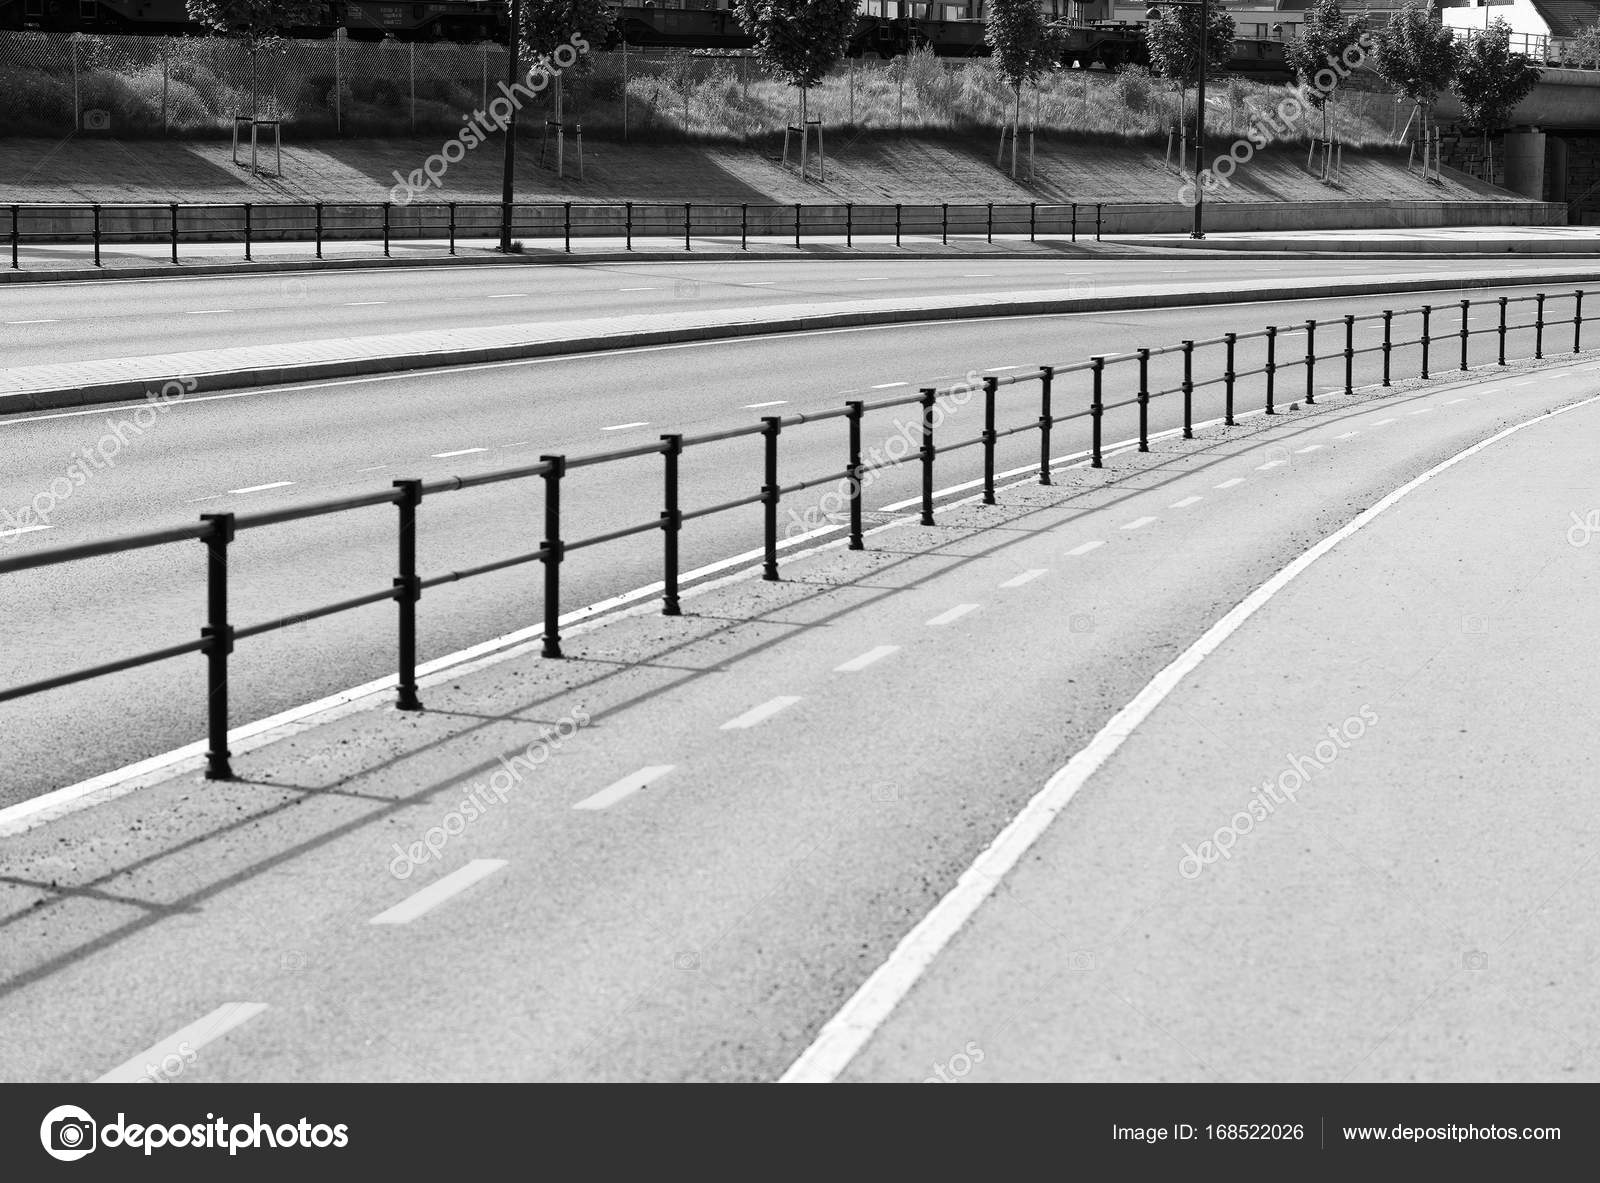 d4b2e61ebf9d Fondo de negro y blanco Noruega camino de línea de separación — Fotos de  Stock